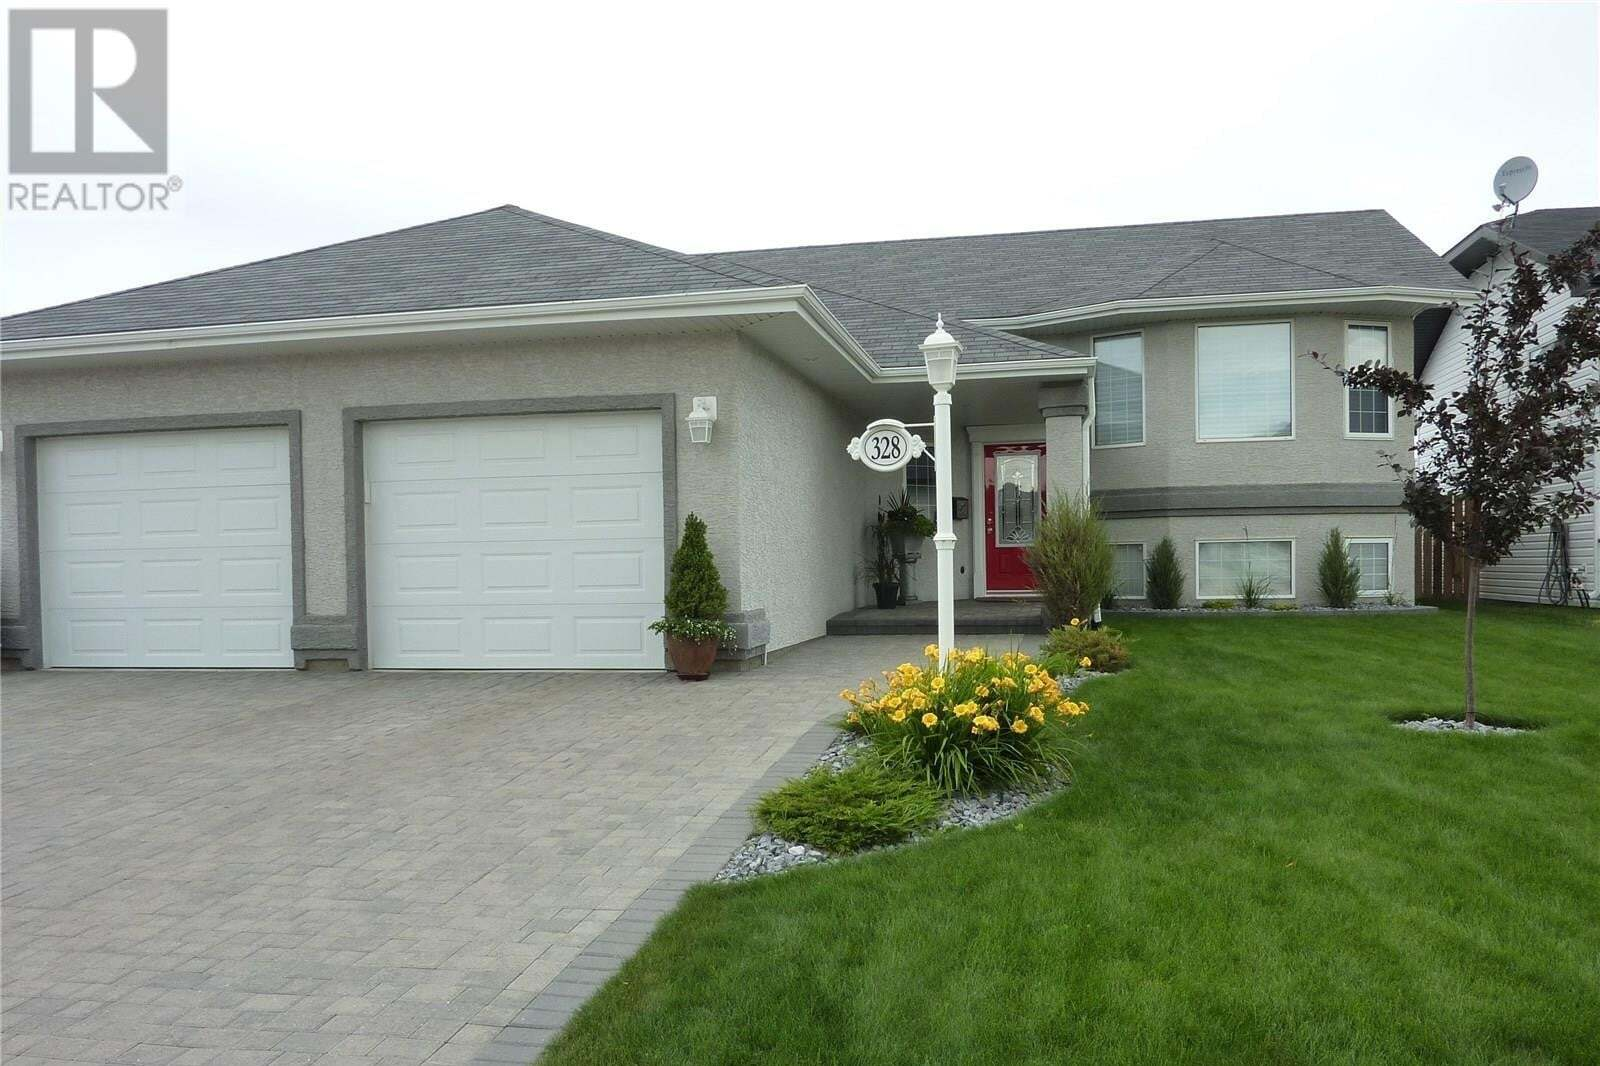 House for sale at 328 Brooklyn Cres Warman Saskatchewan - MLS: SK826888